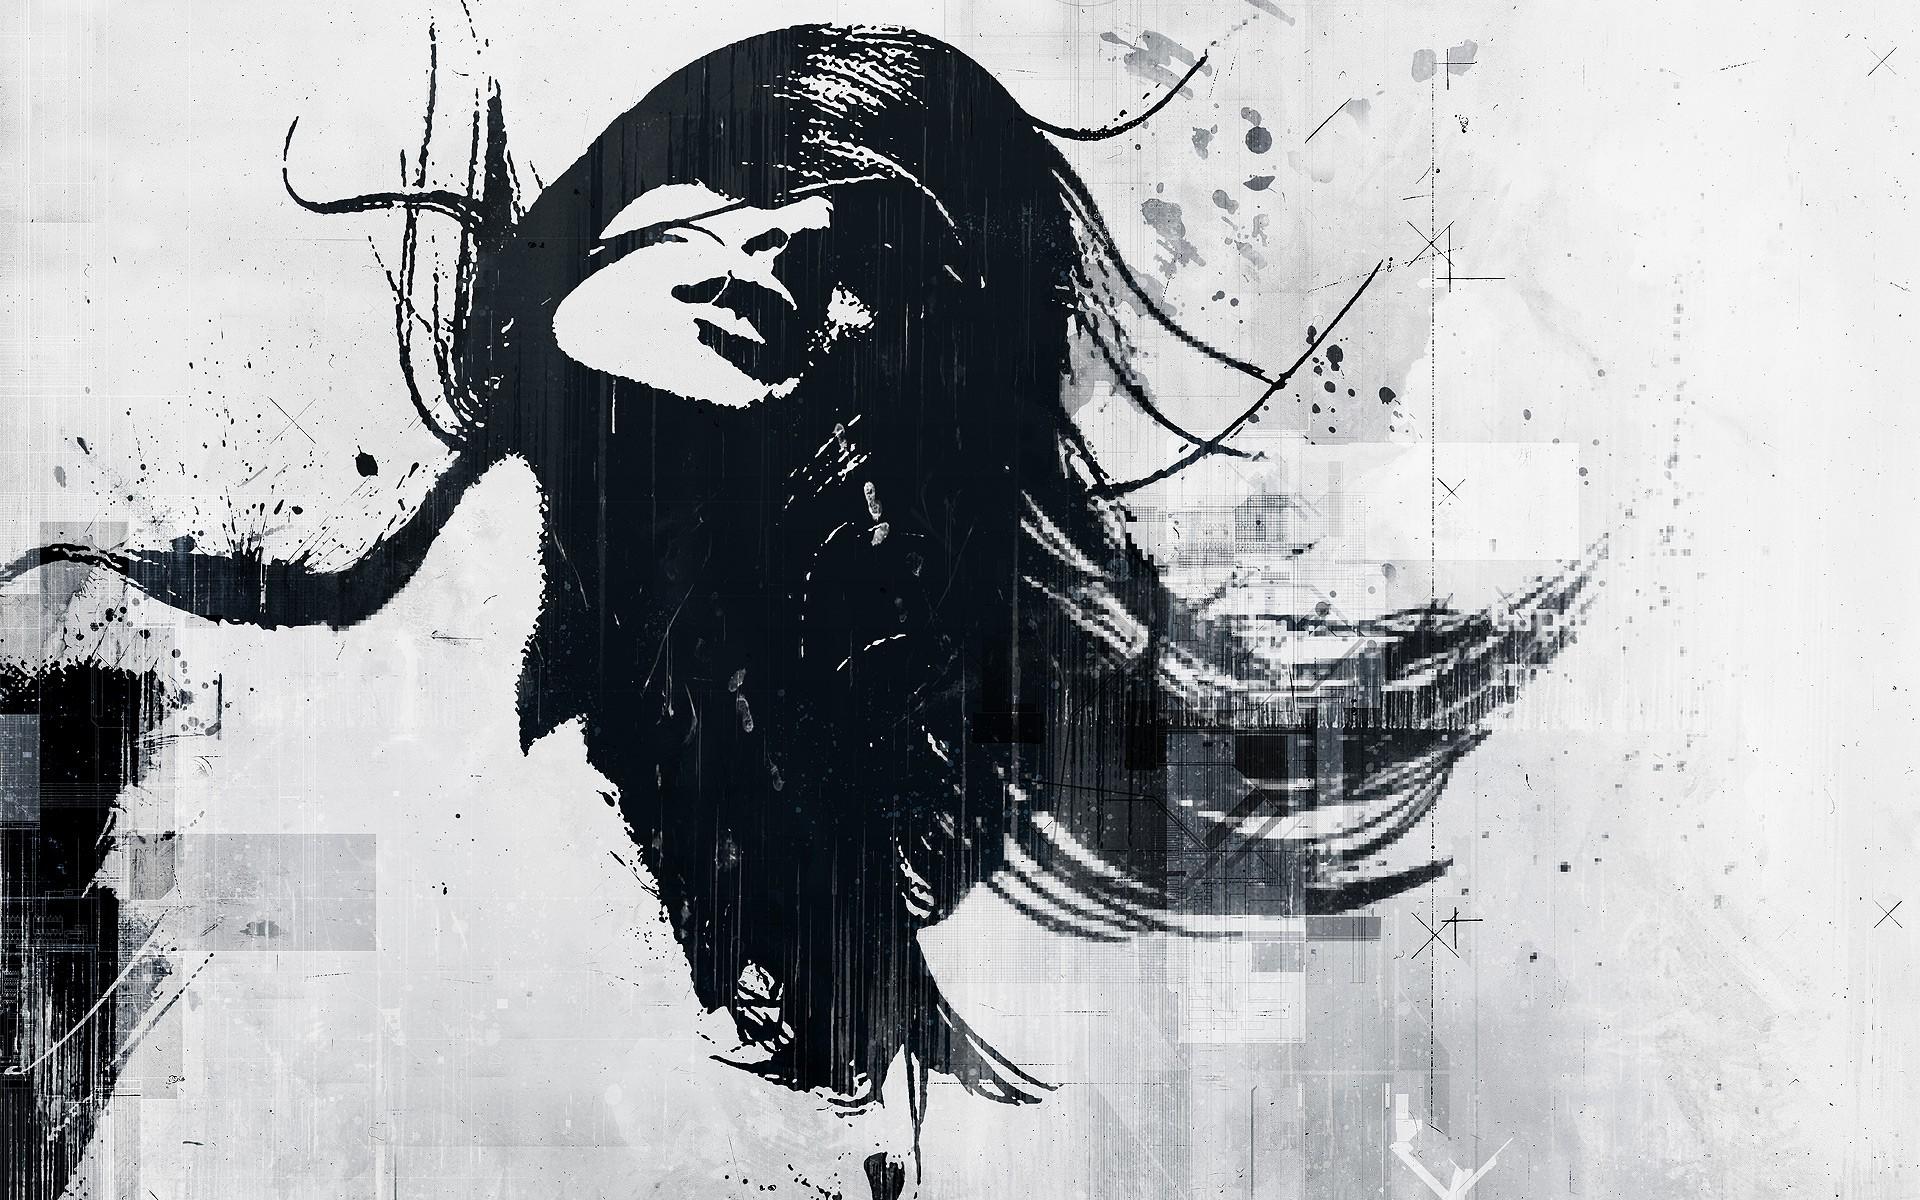 Fond D Ecran Dessin Illustration Femmes Monochrome